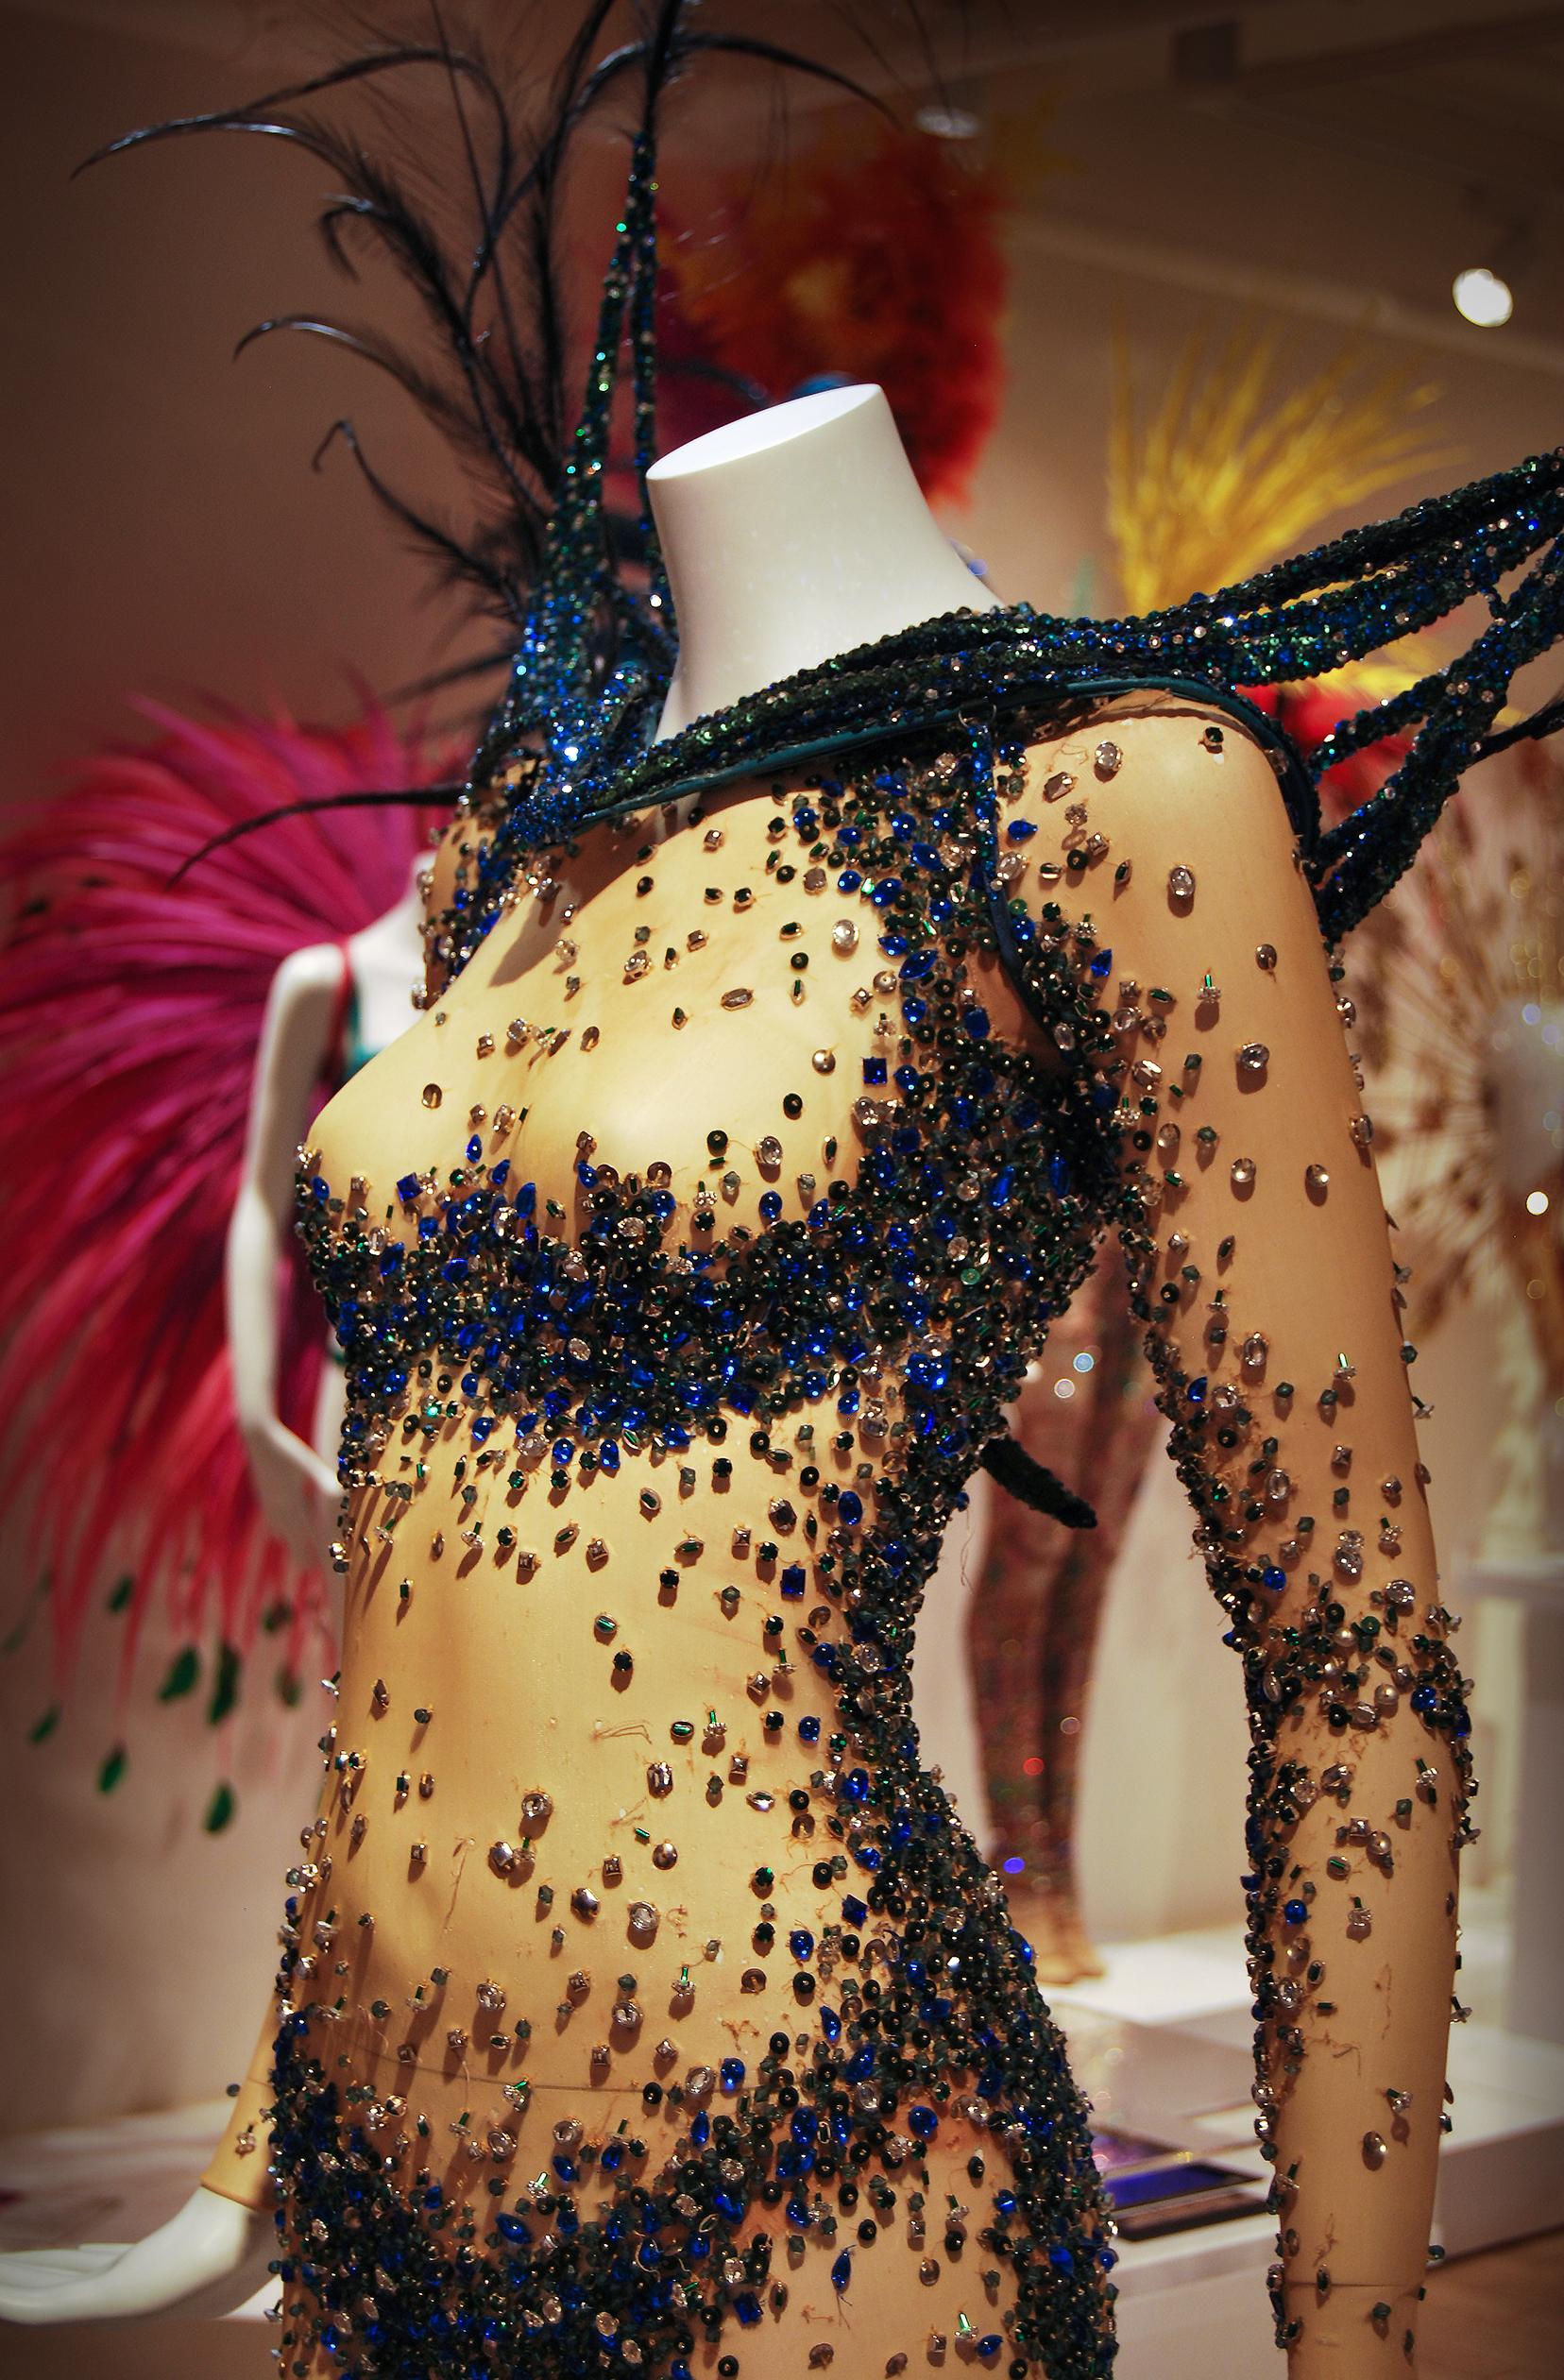 BRIGHT NIGHT ANGEL. Hand-embroidered bodysuit with Swarovski crystals